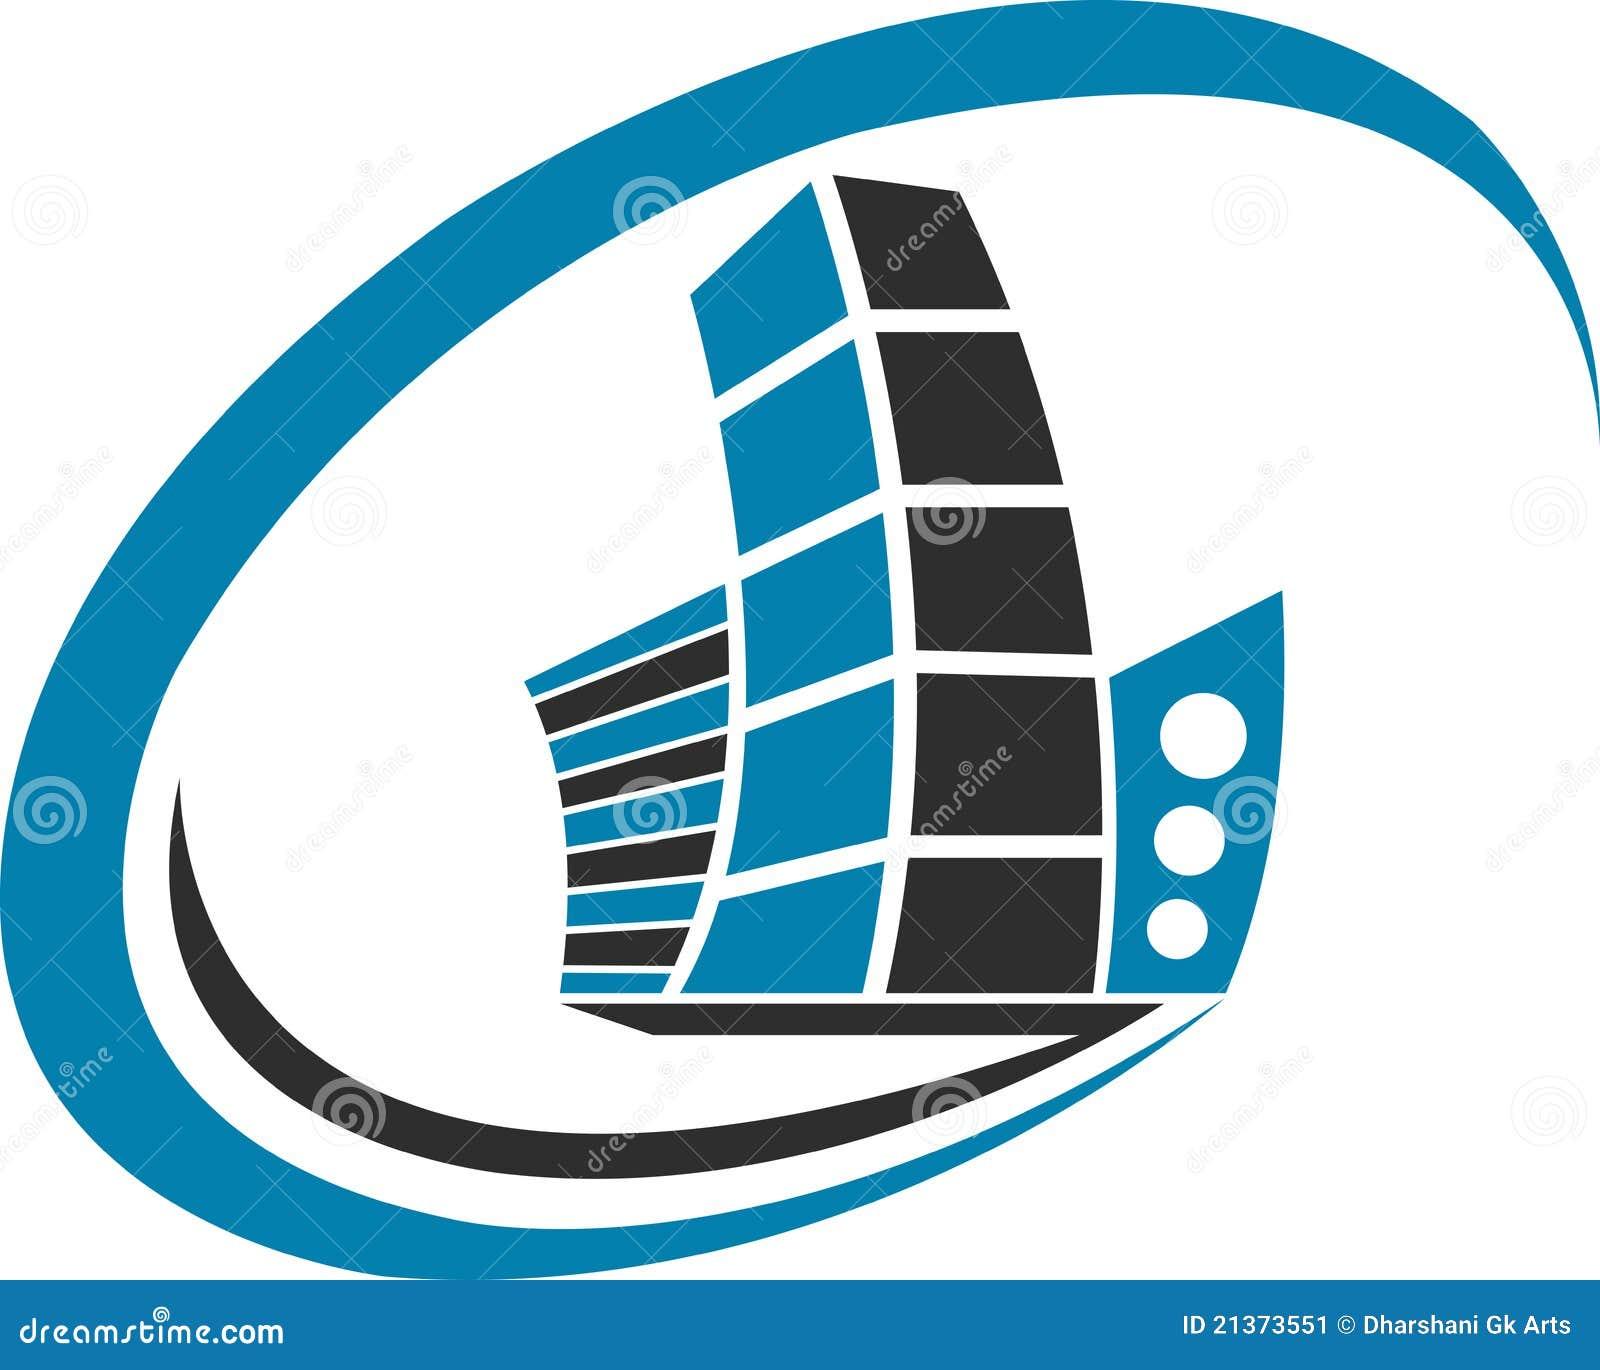 Building Logo Stock Image Image 21373551